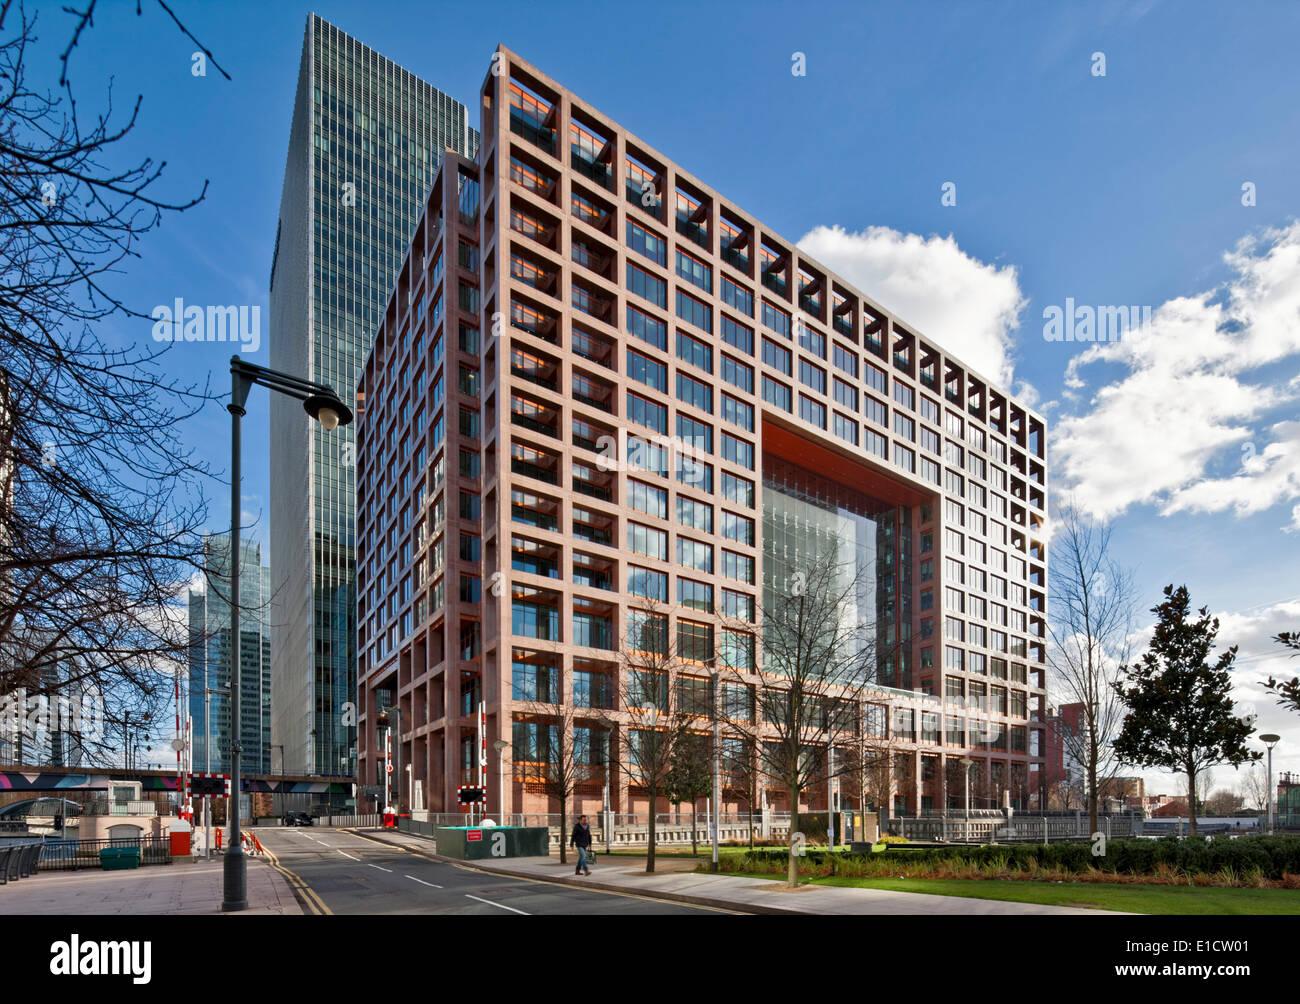 20 Bank Street - Morgan Stanley Building, London, United Kingdom